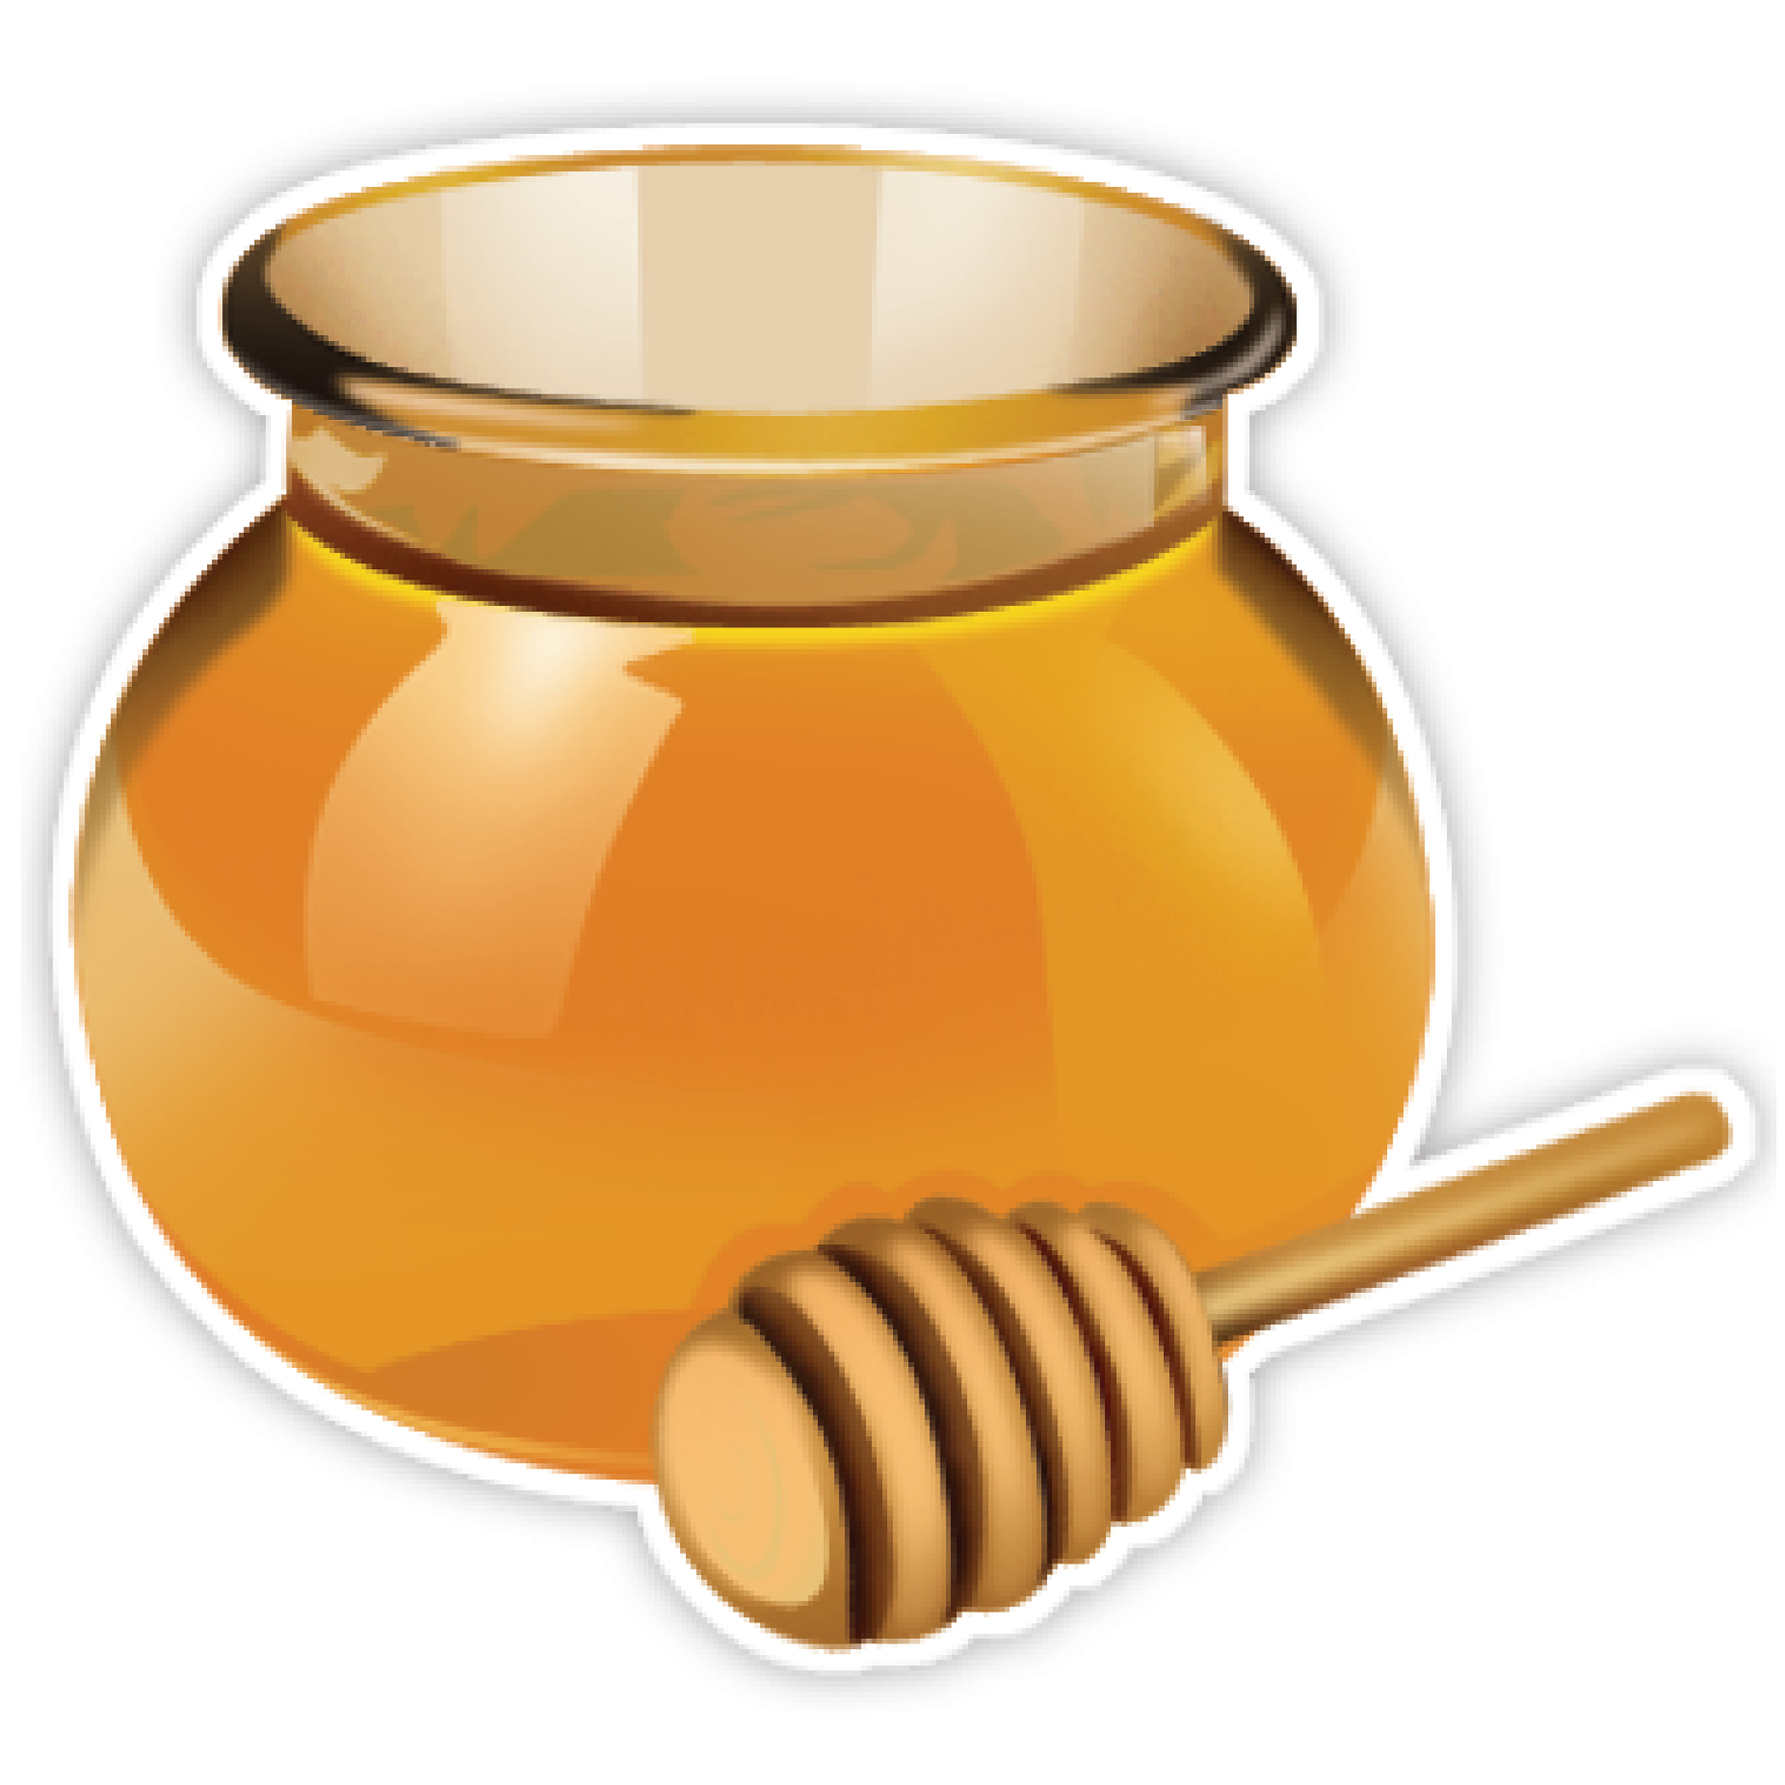 Clipart honey jar royalty free library Free Honey Jar Cliparts, Download Free Clip Art, Free Clip Art on ... royalty free library